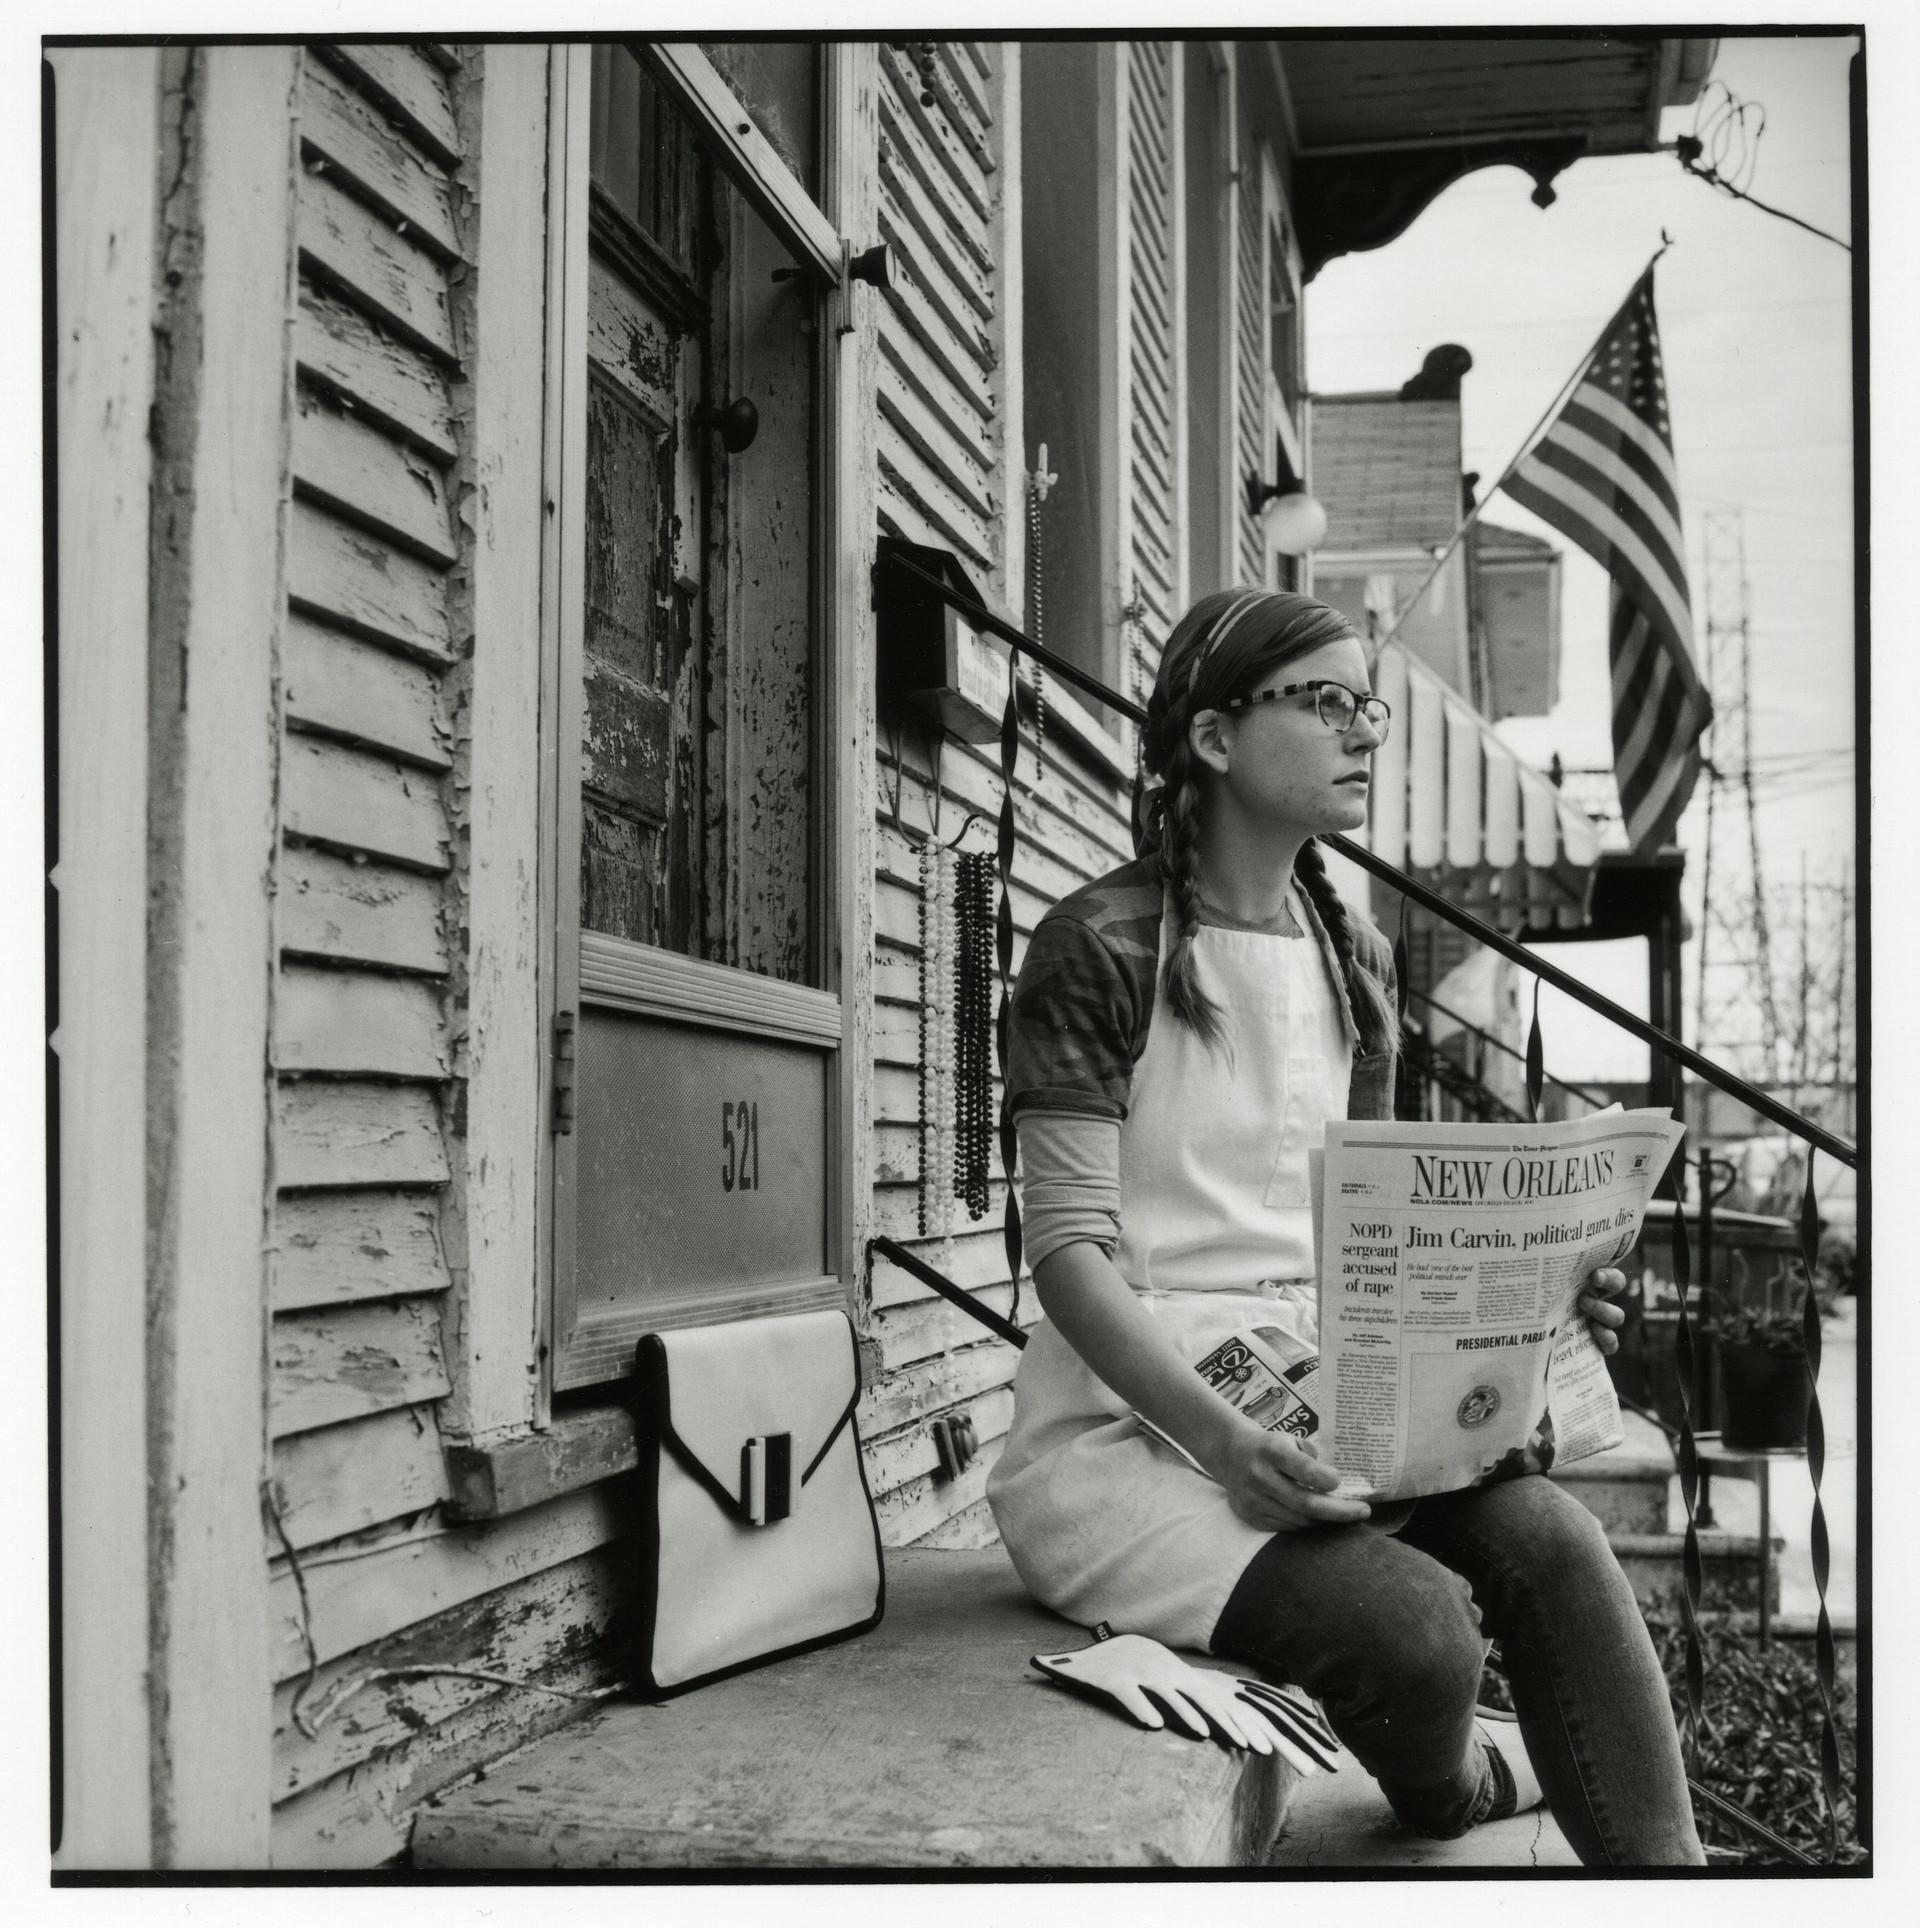 New Orleans 8 ©︎ Chantal Stoman